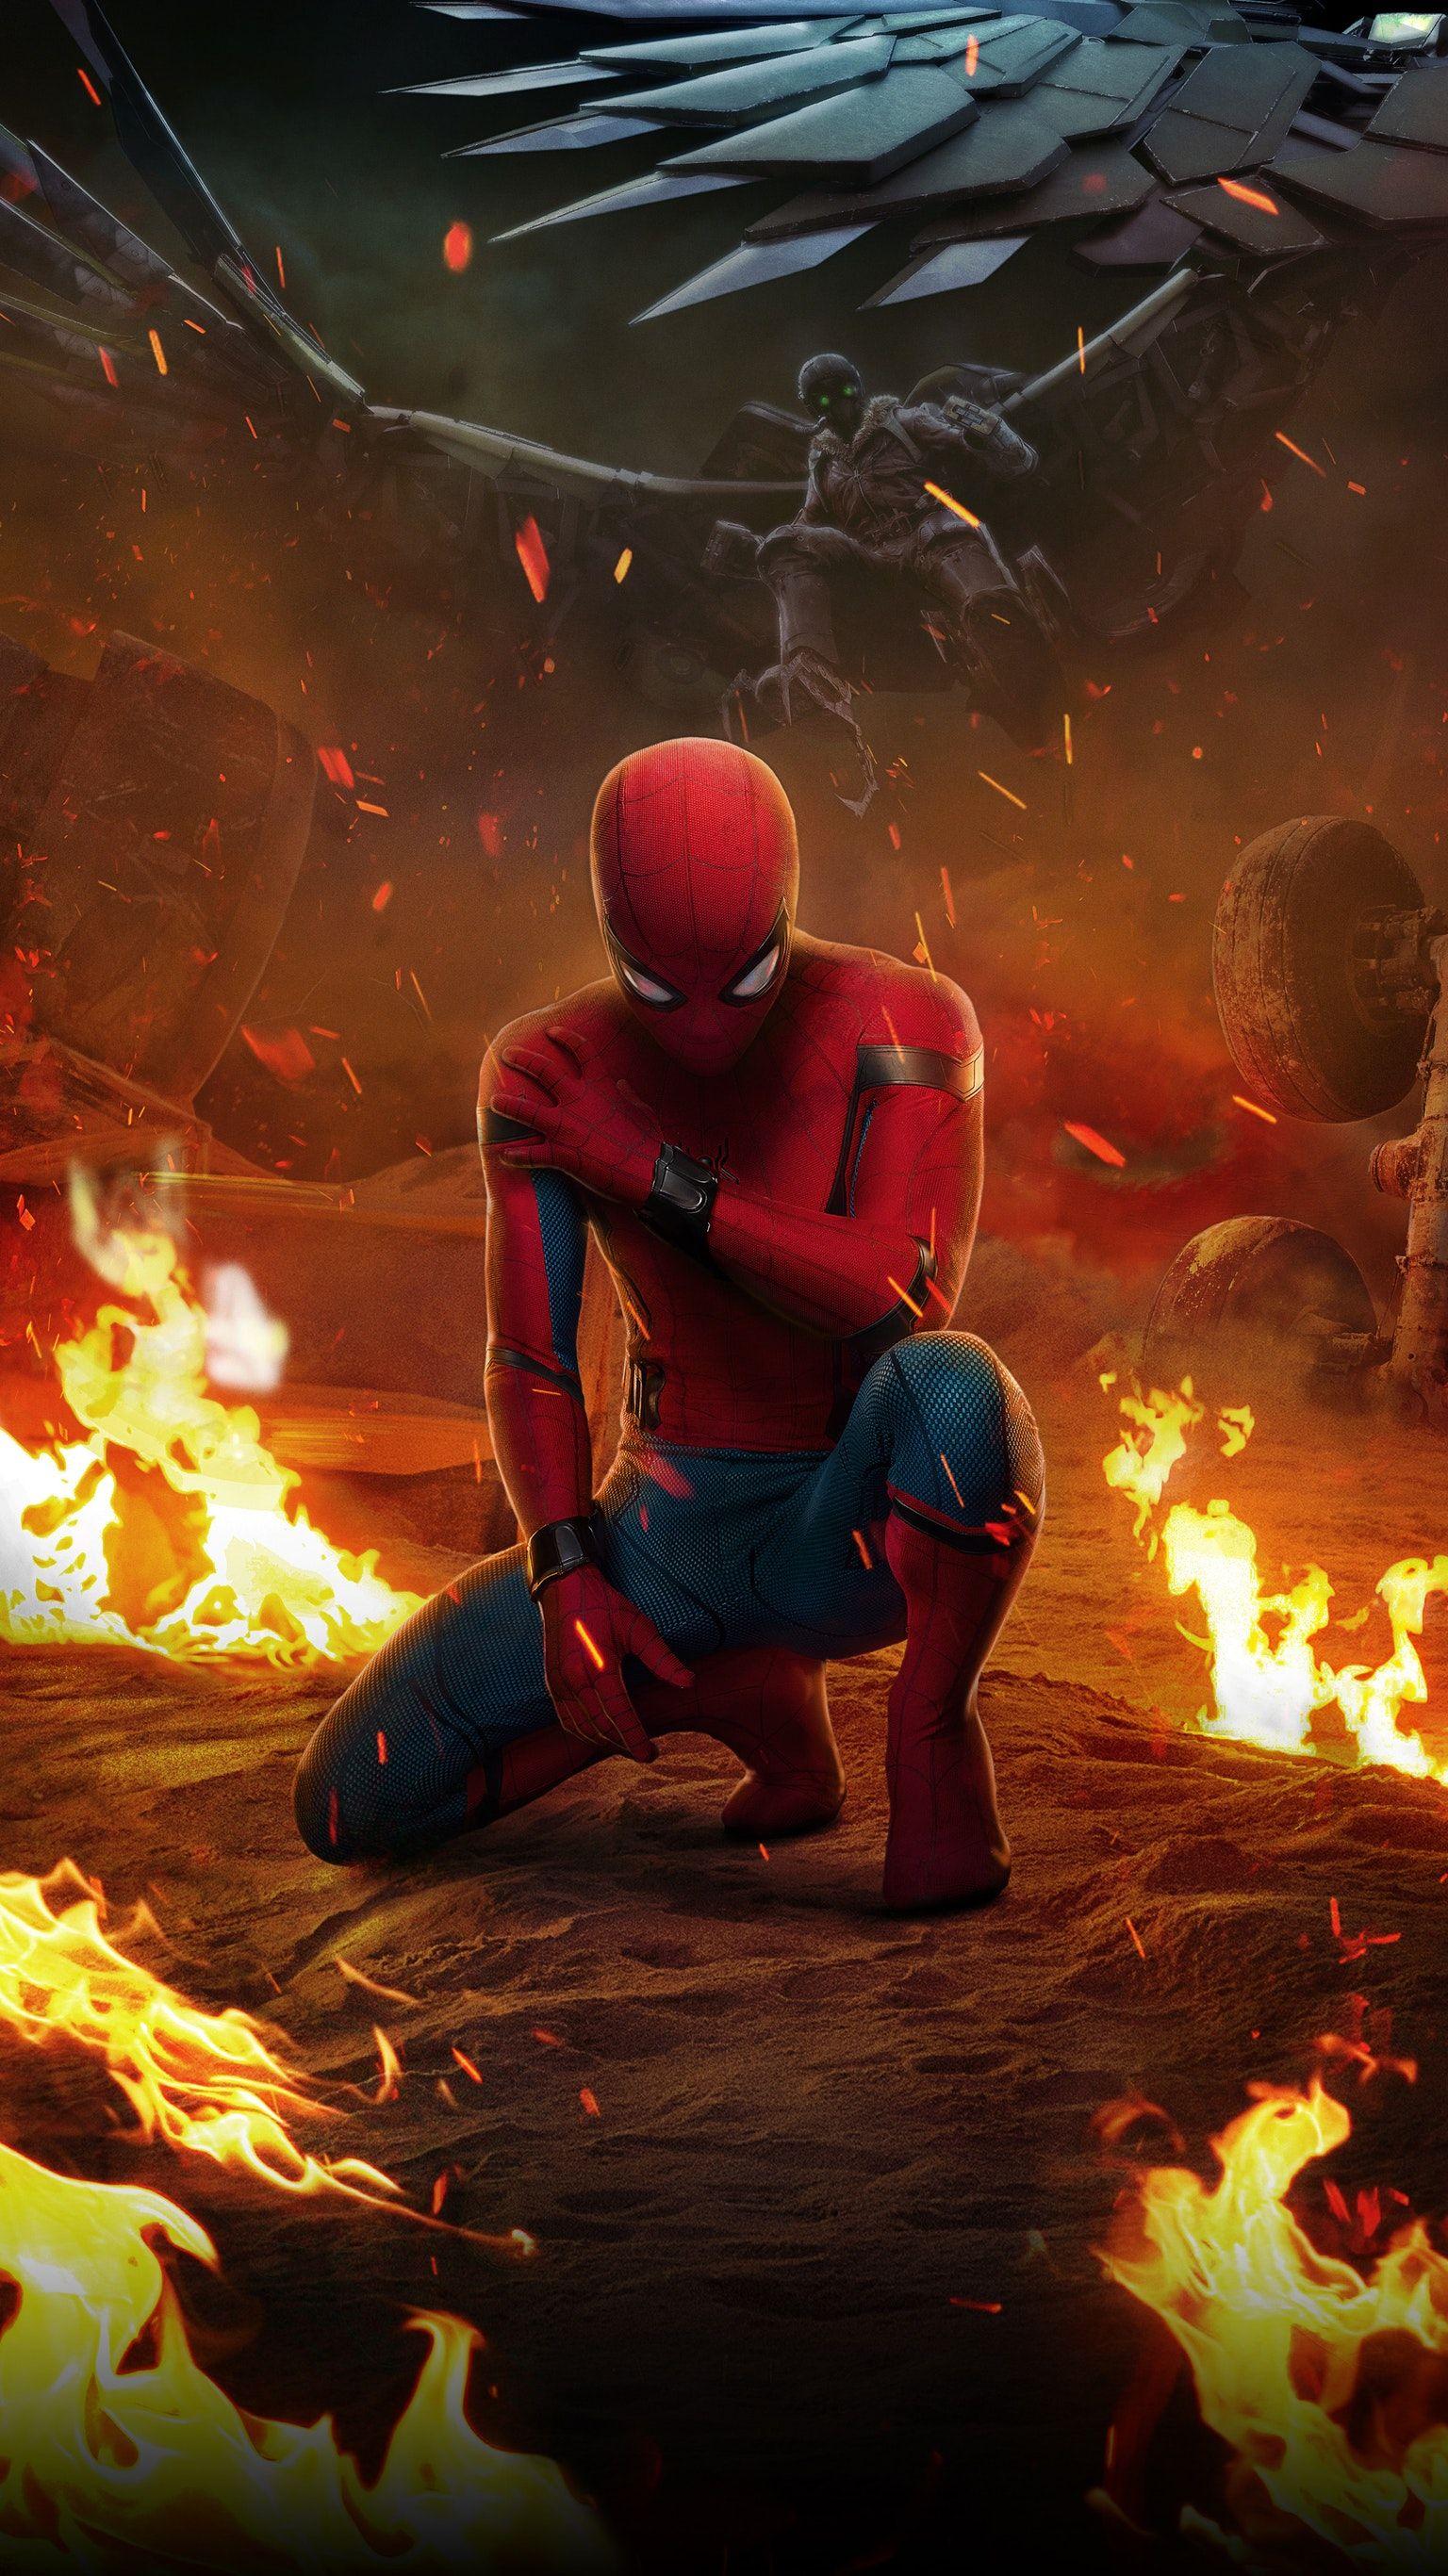 Spider Man Homecoming 2017 Phone Wallpaper Spiderman Marvel Marvel Spiderman